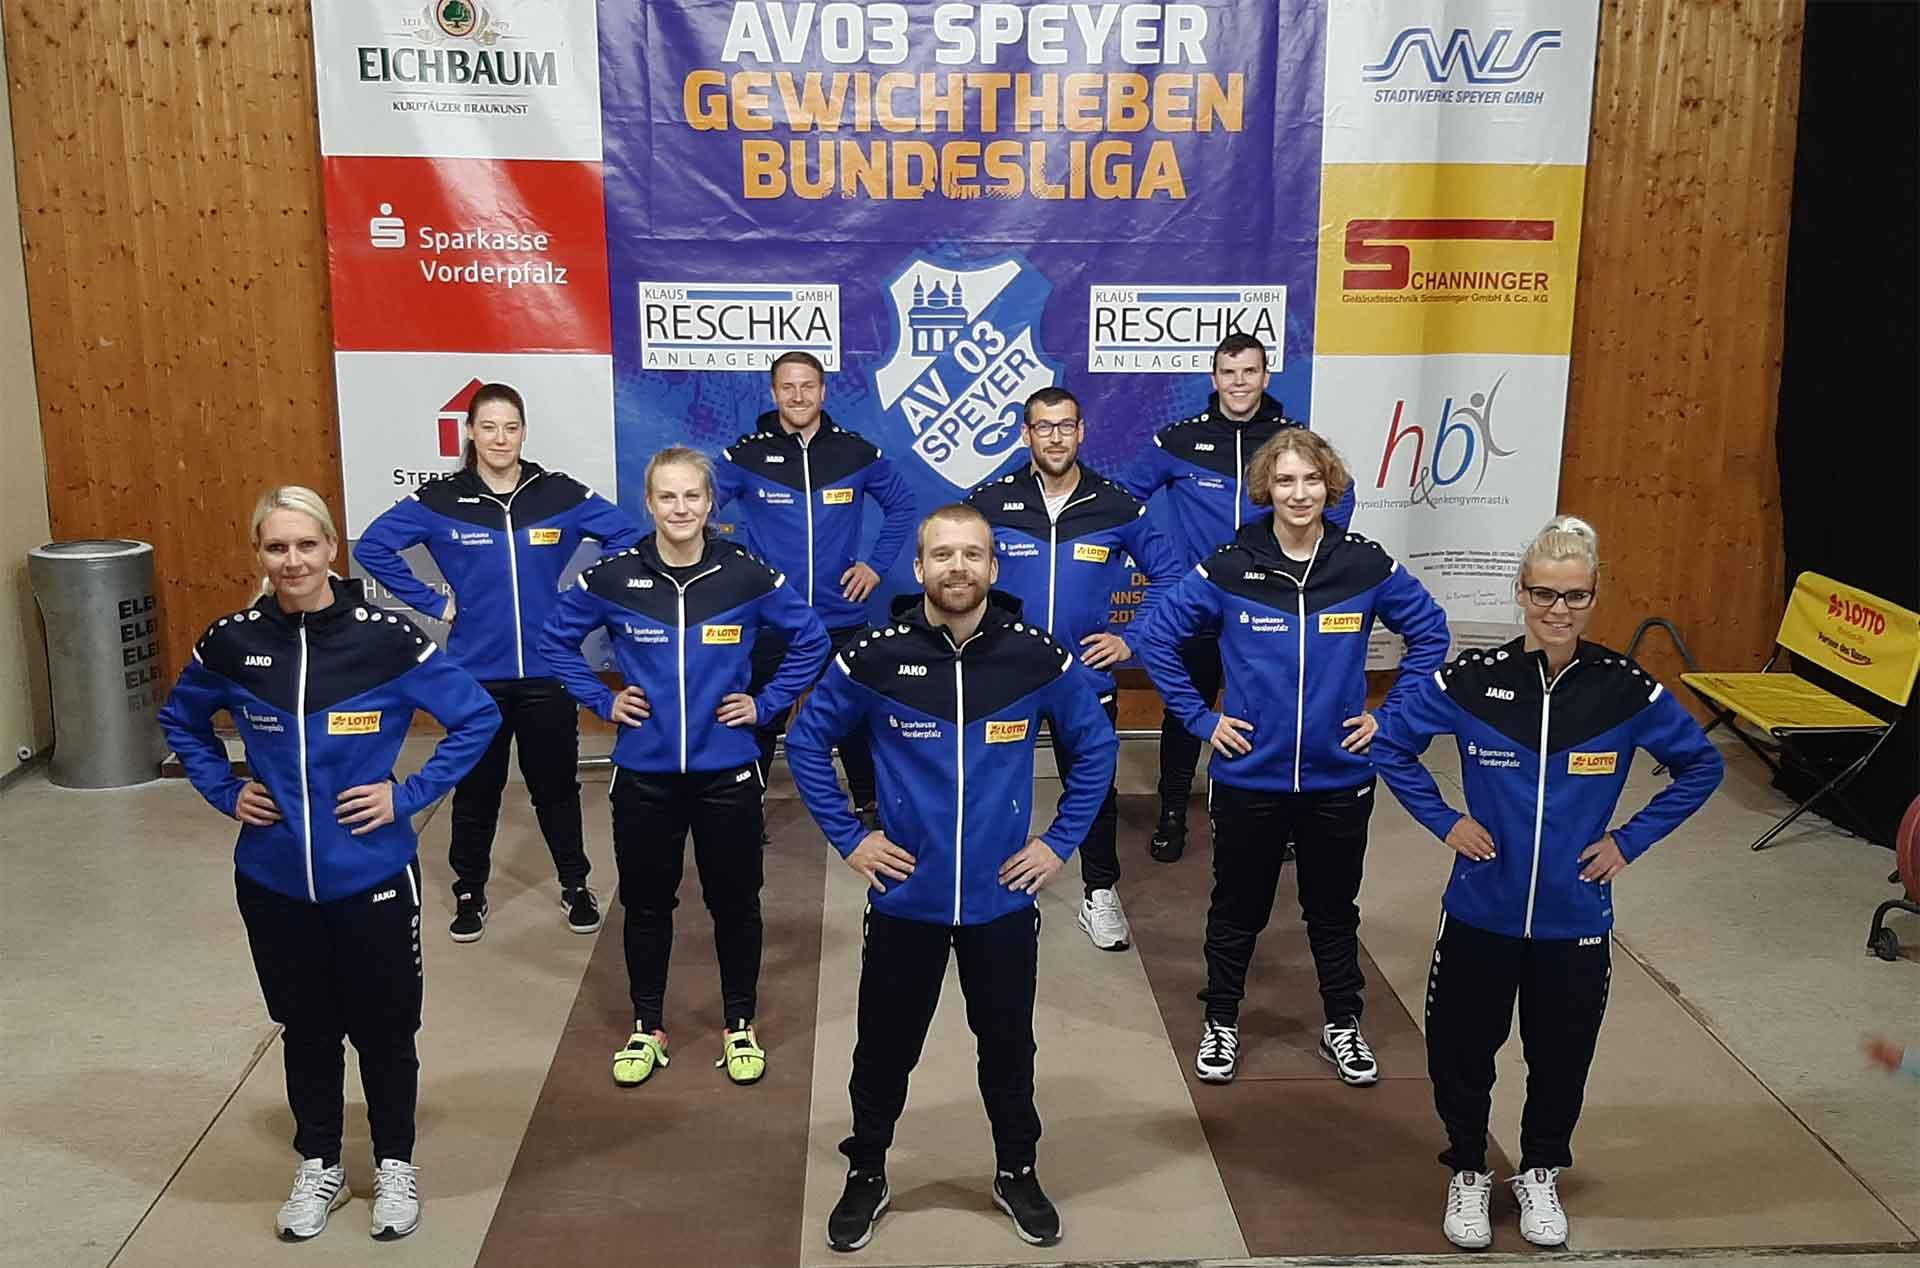 AV 03 Speyer Bundesliga Gewichtheben 2020